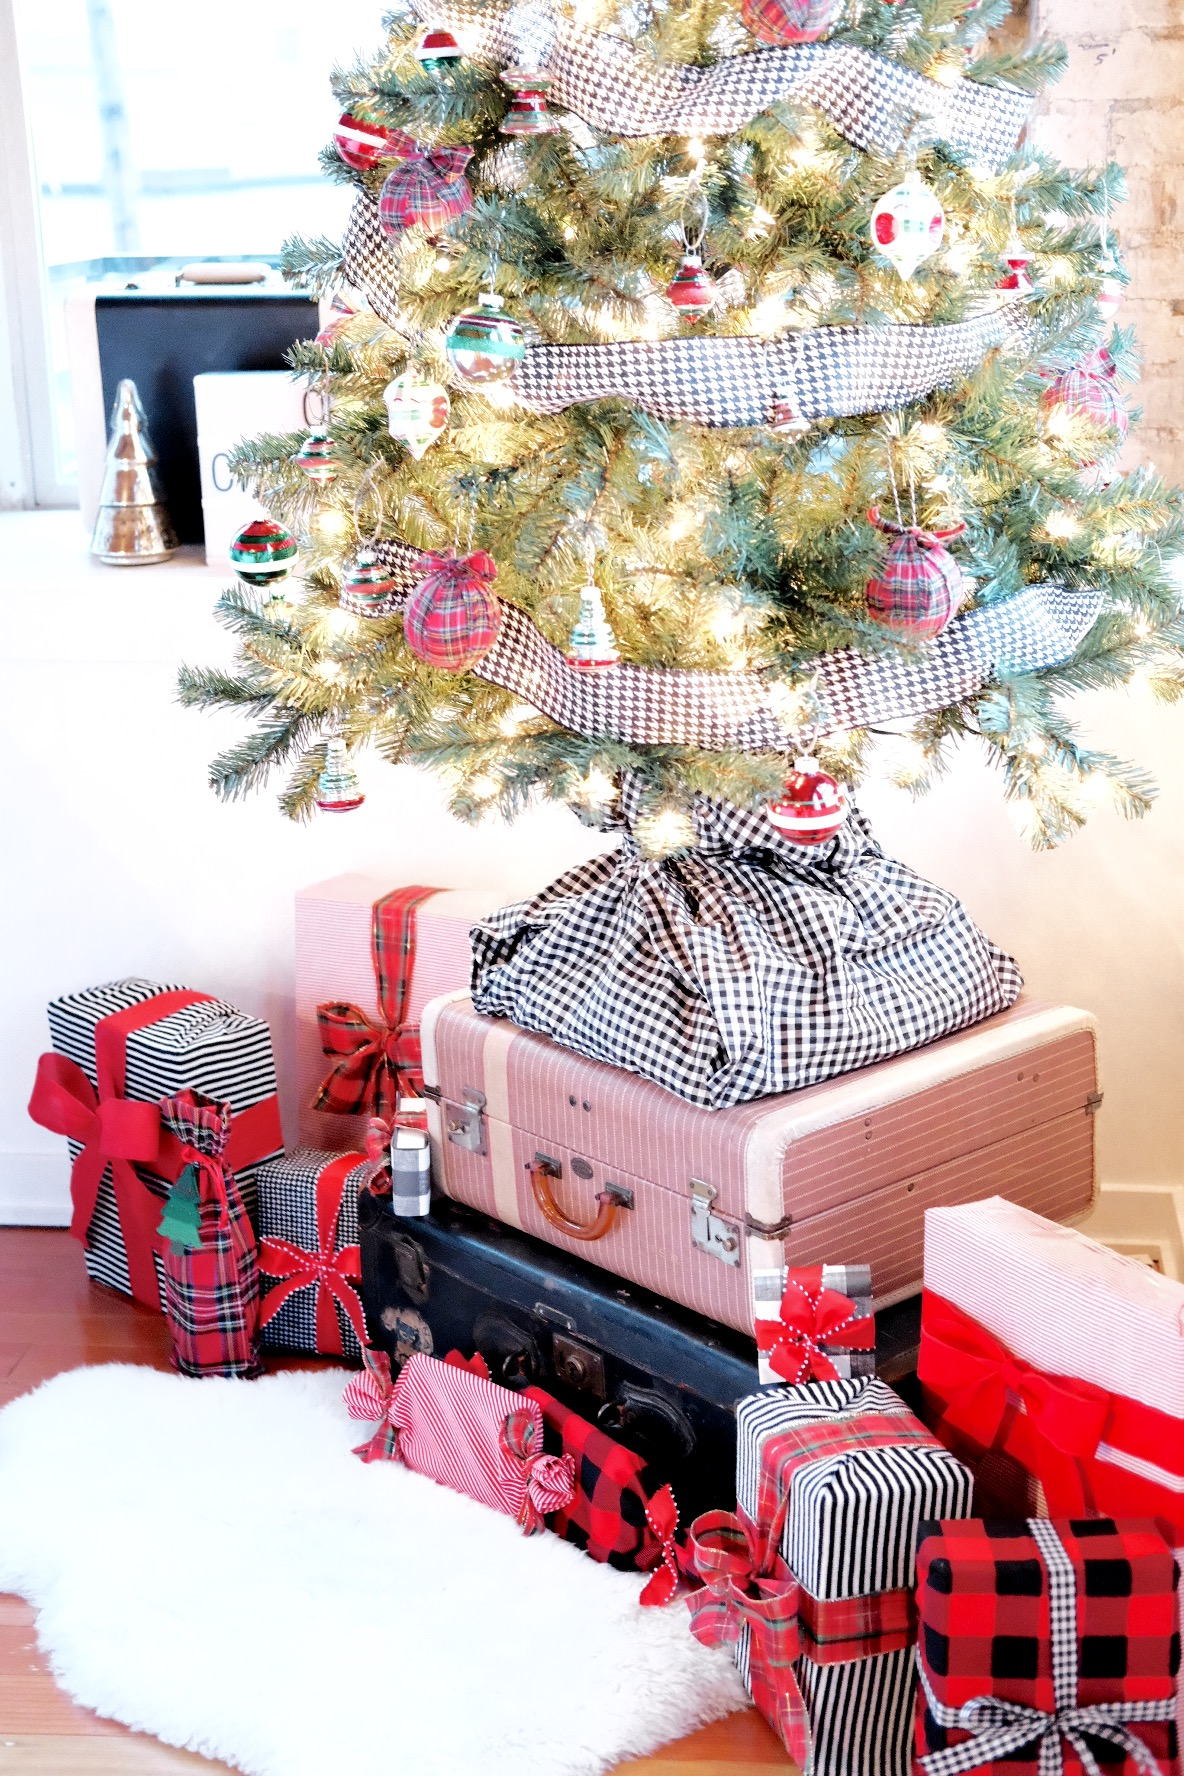 Plaid Christmas ornaments, Small Christmas Tree decorations, Dog Proof Christmas Tree, Christmas Tree on Vintage Suitcases, Fake Christmas Tree DIY Skirt